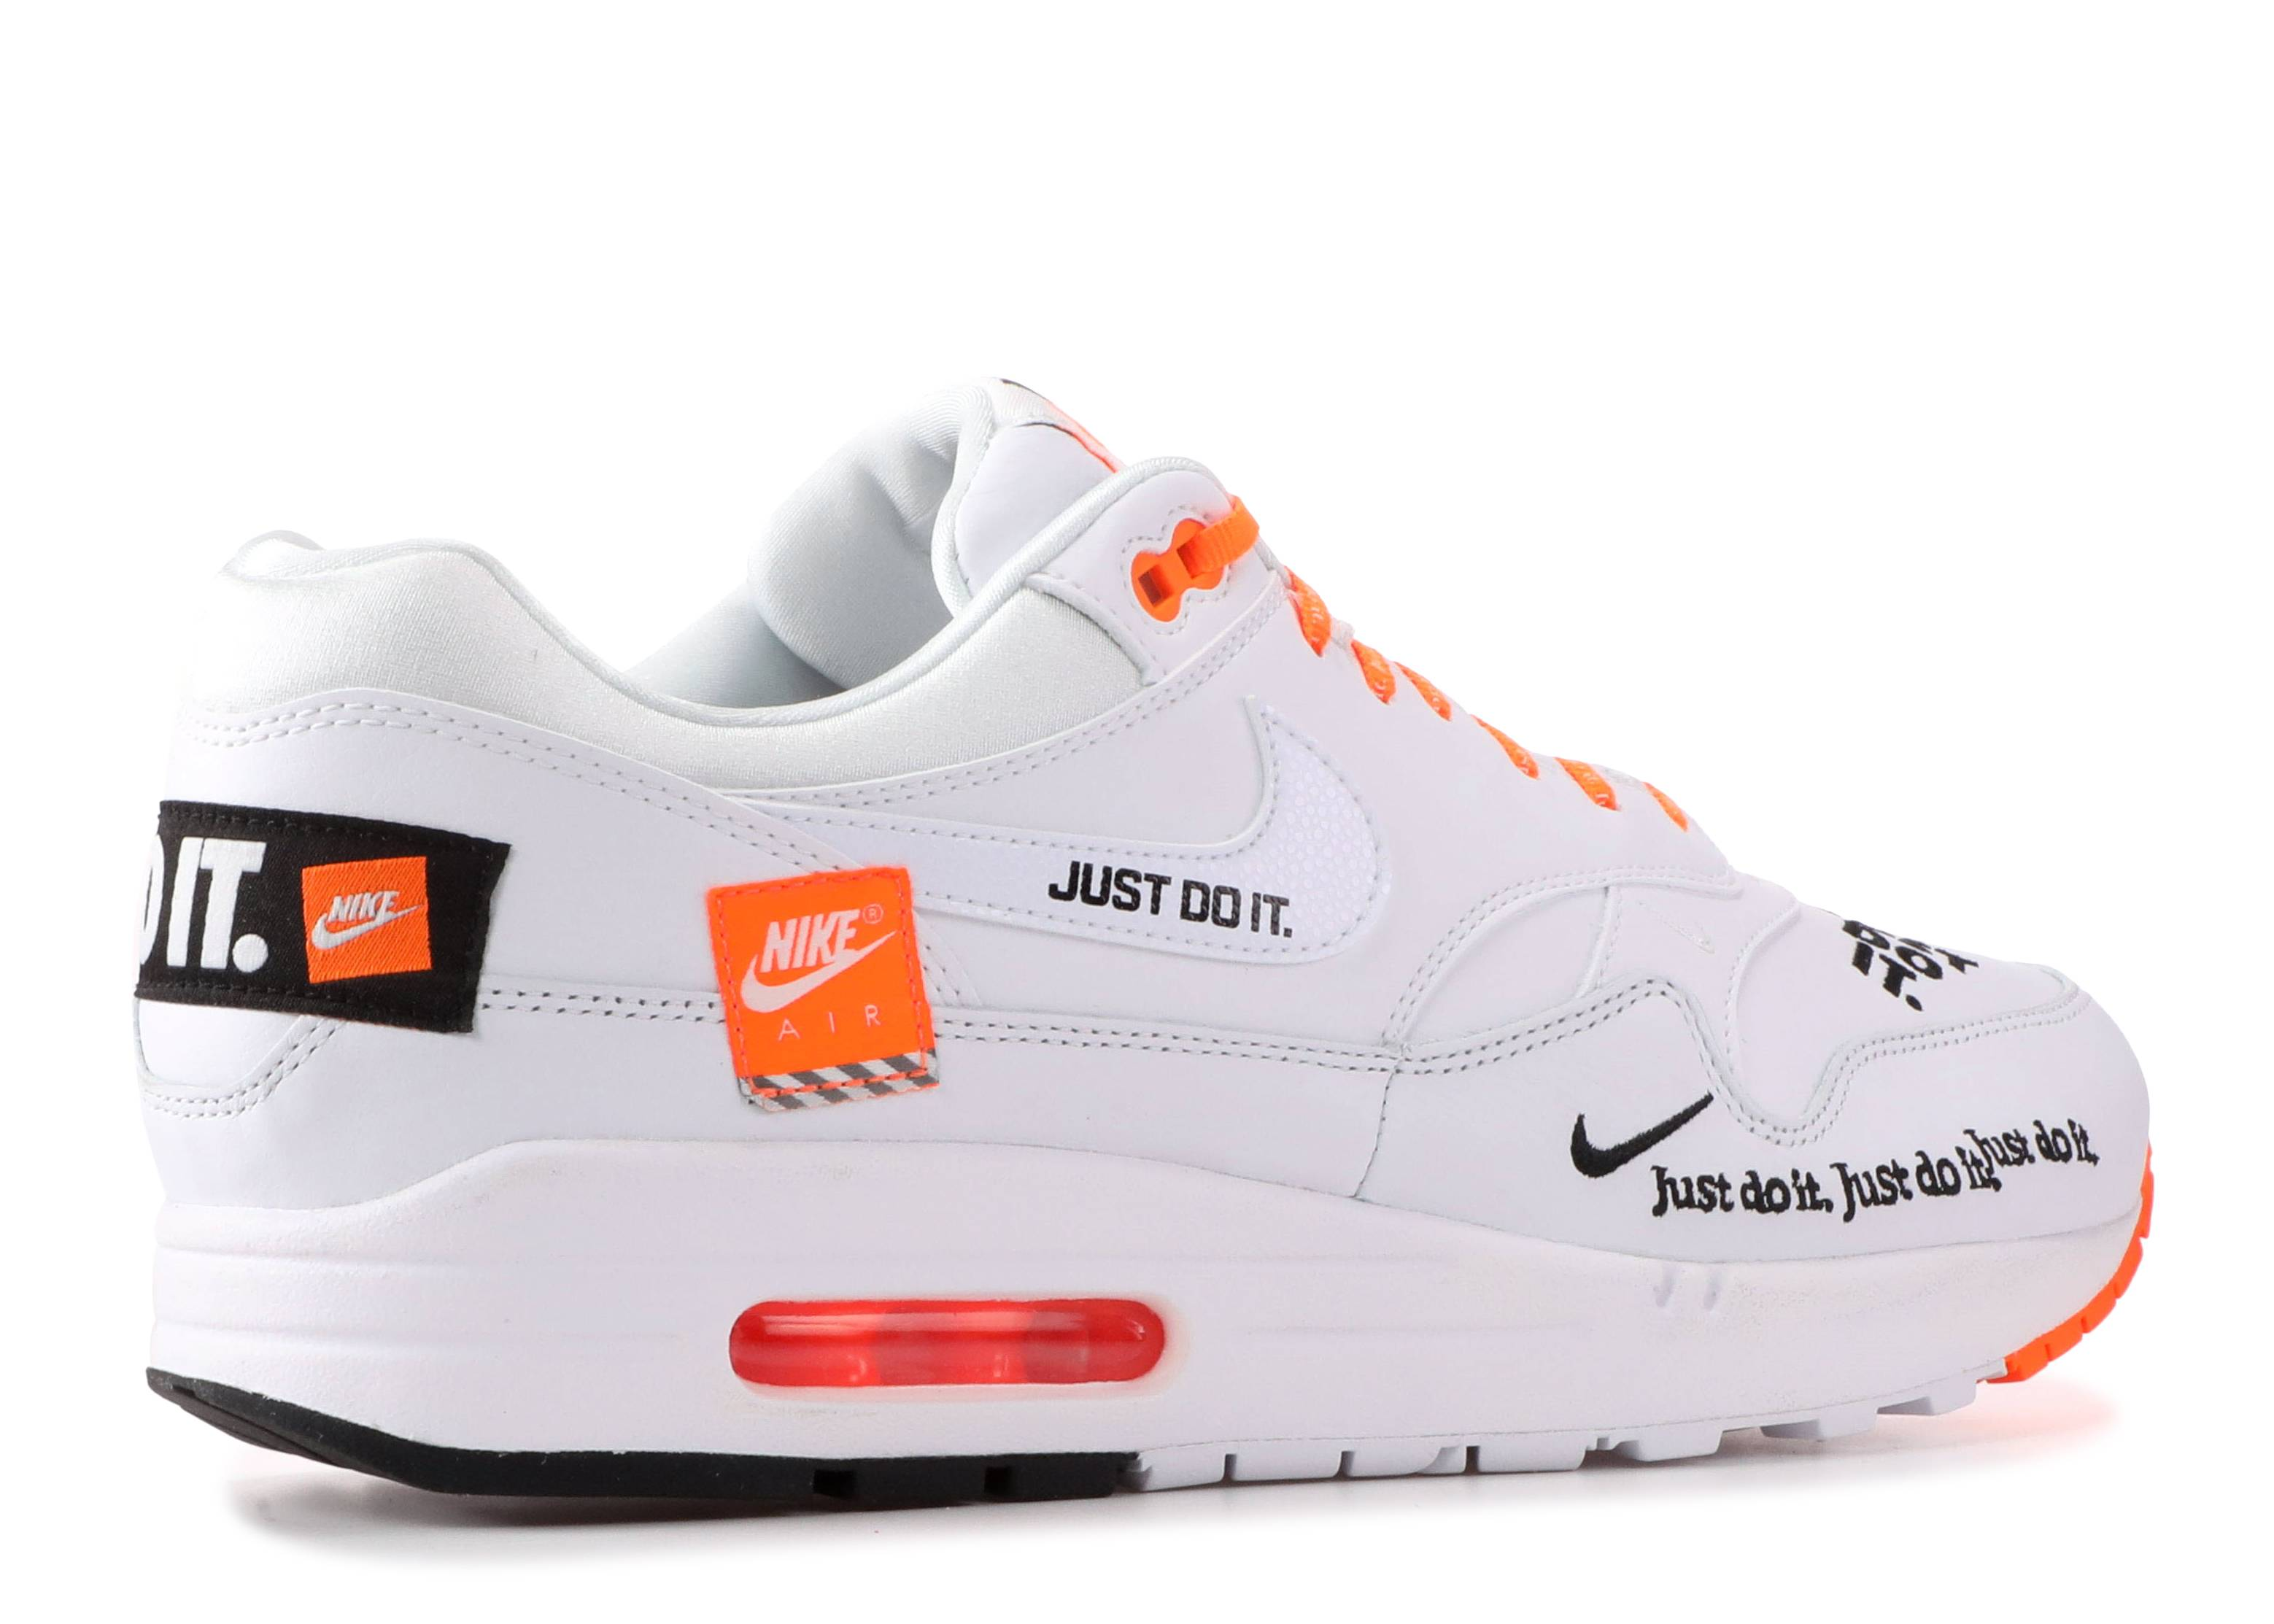 Air Max 1 'Just Do It' - Nike - AO1021 100 - white/orange/black ...